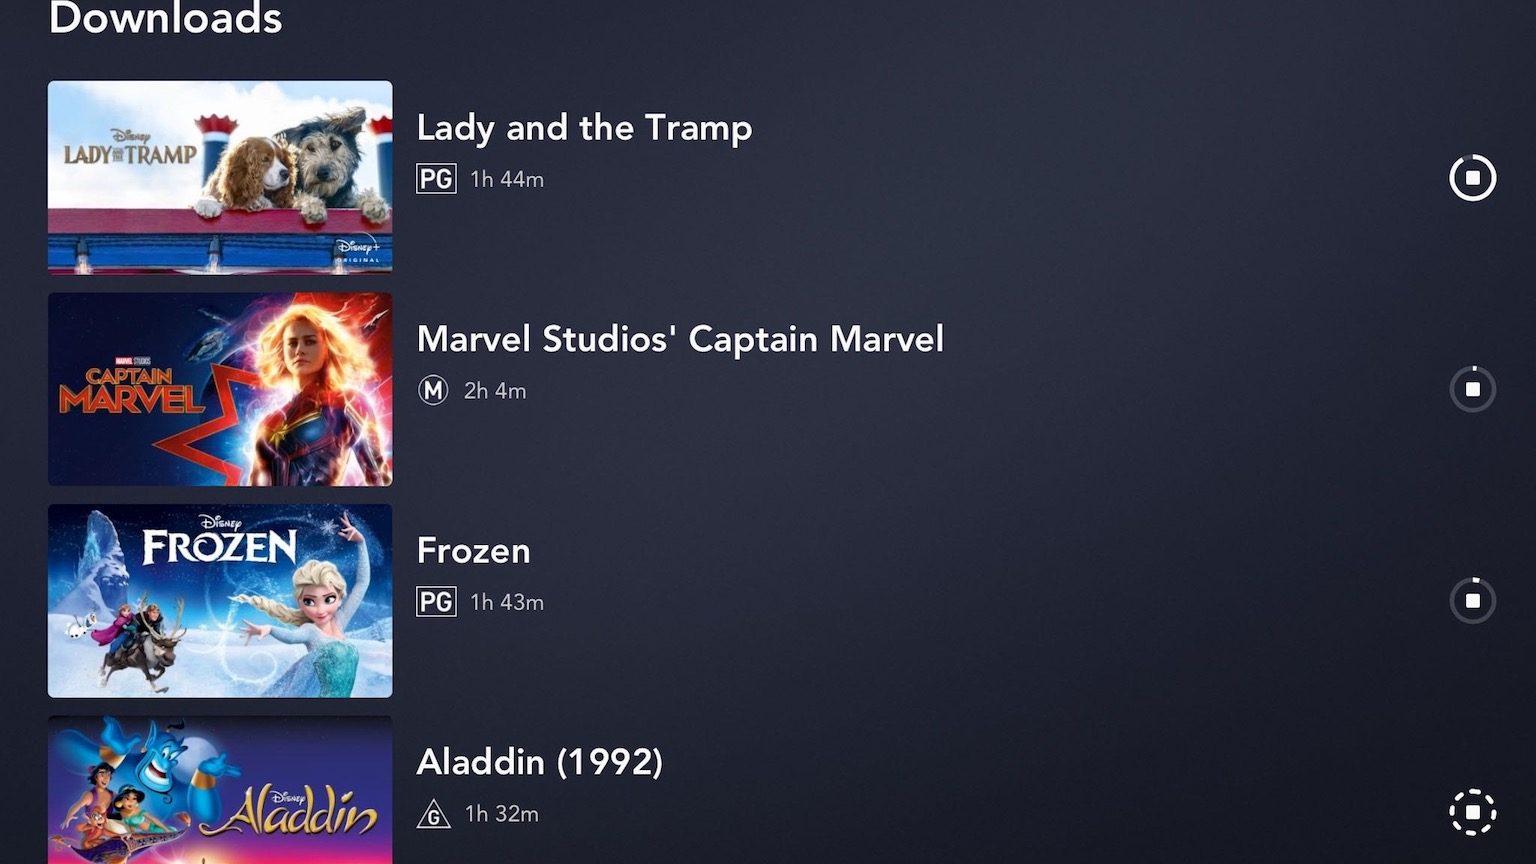 Disney downloads